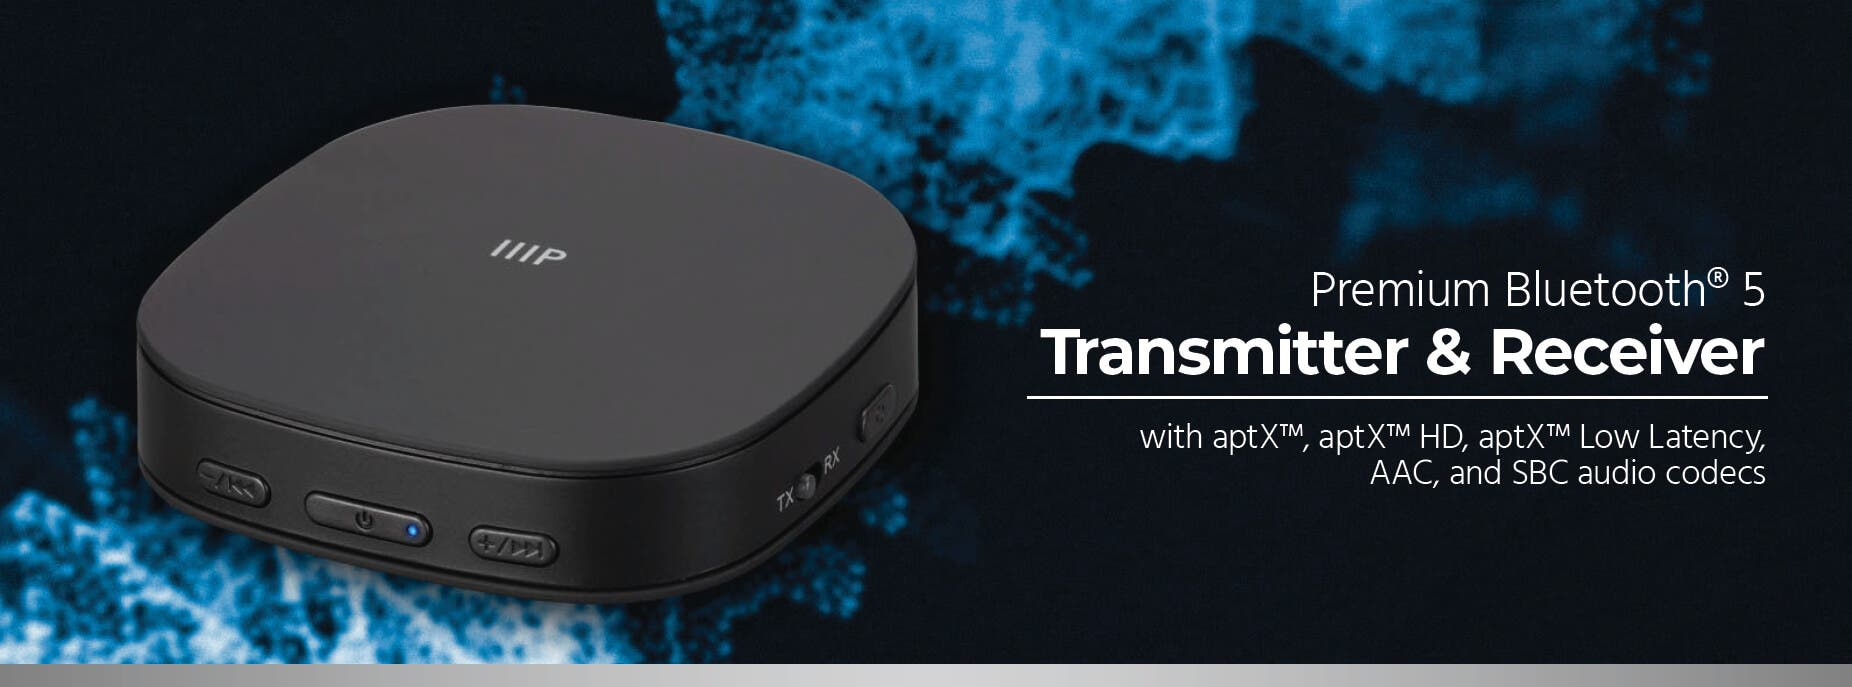 Bluetooth 5 Transmitter & Receiver